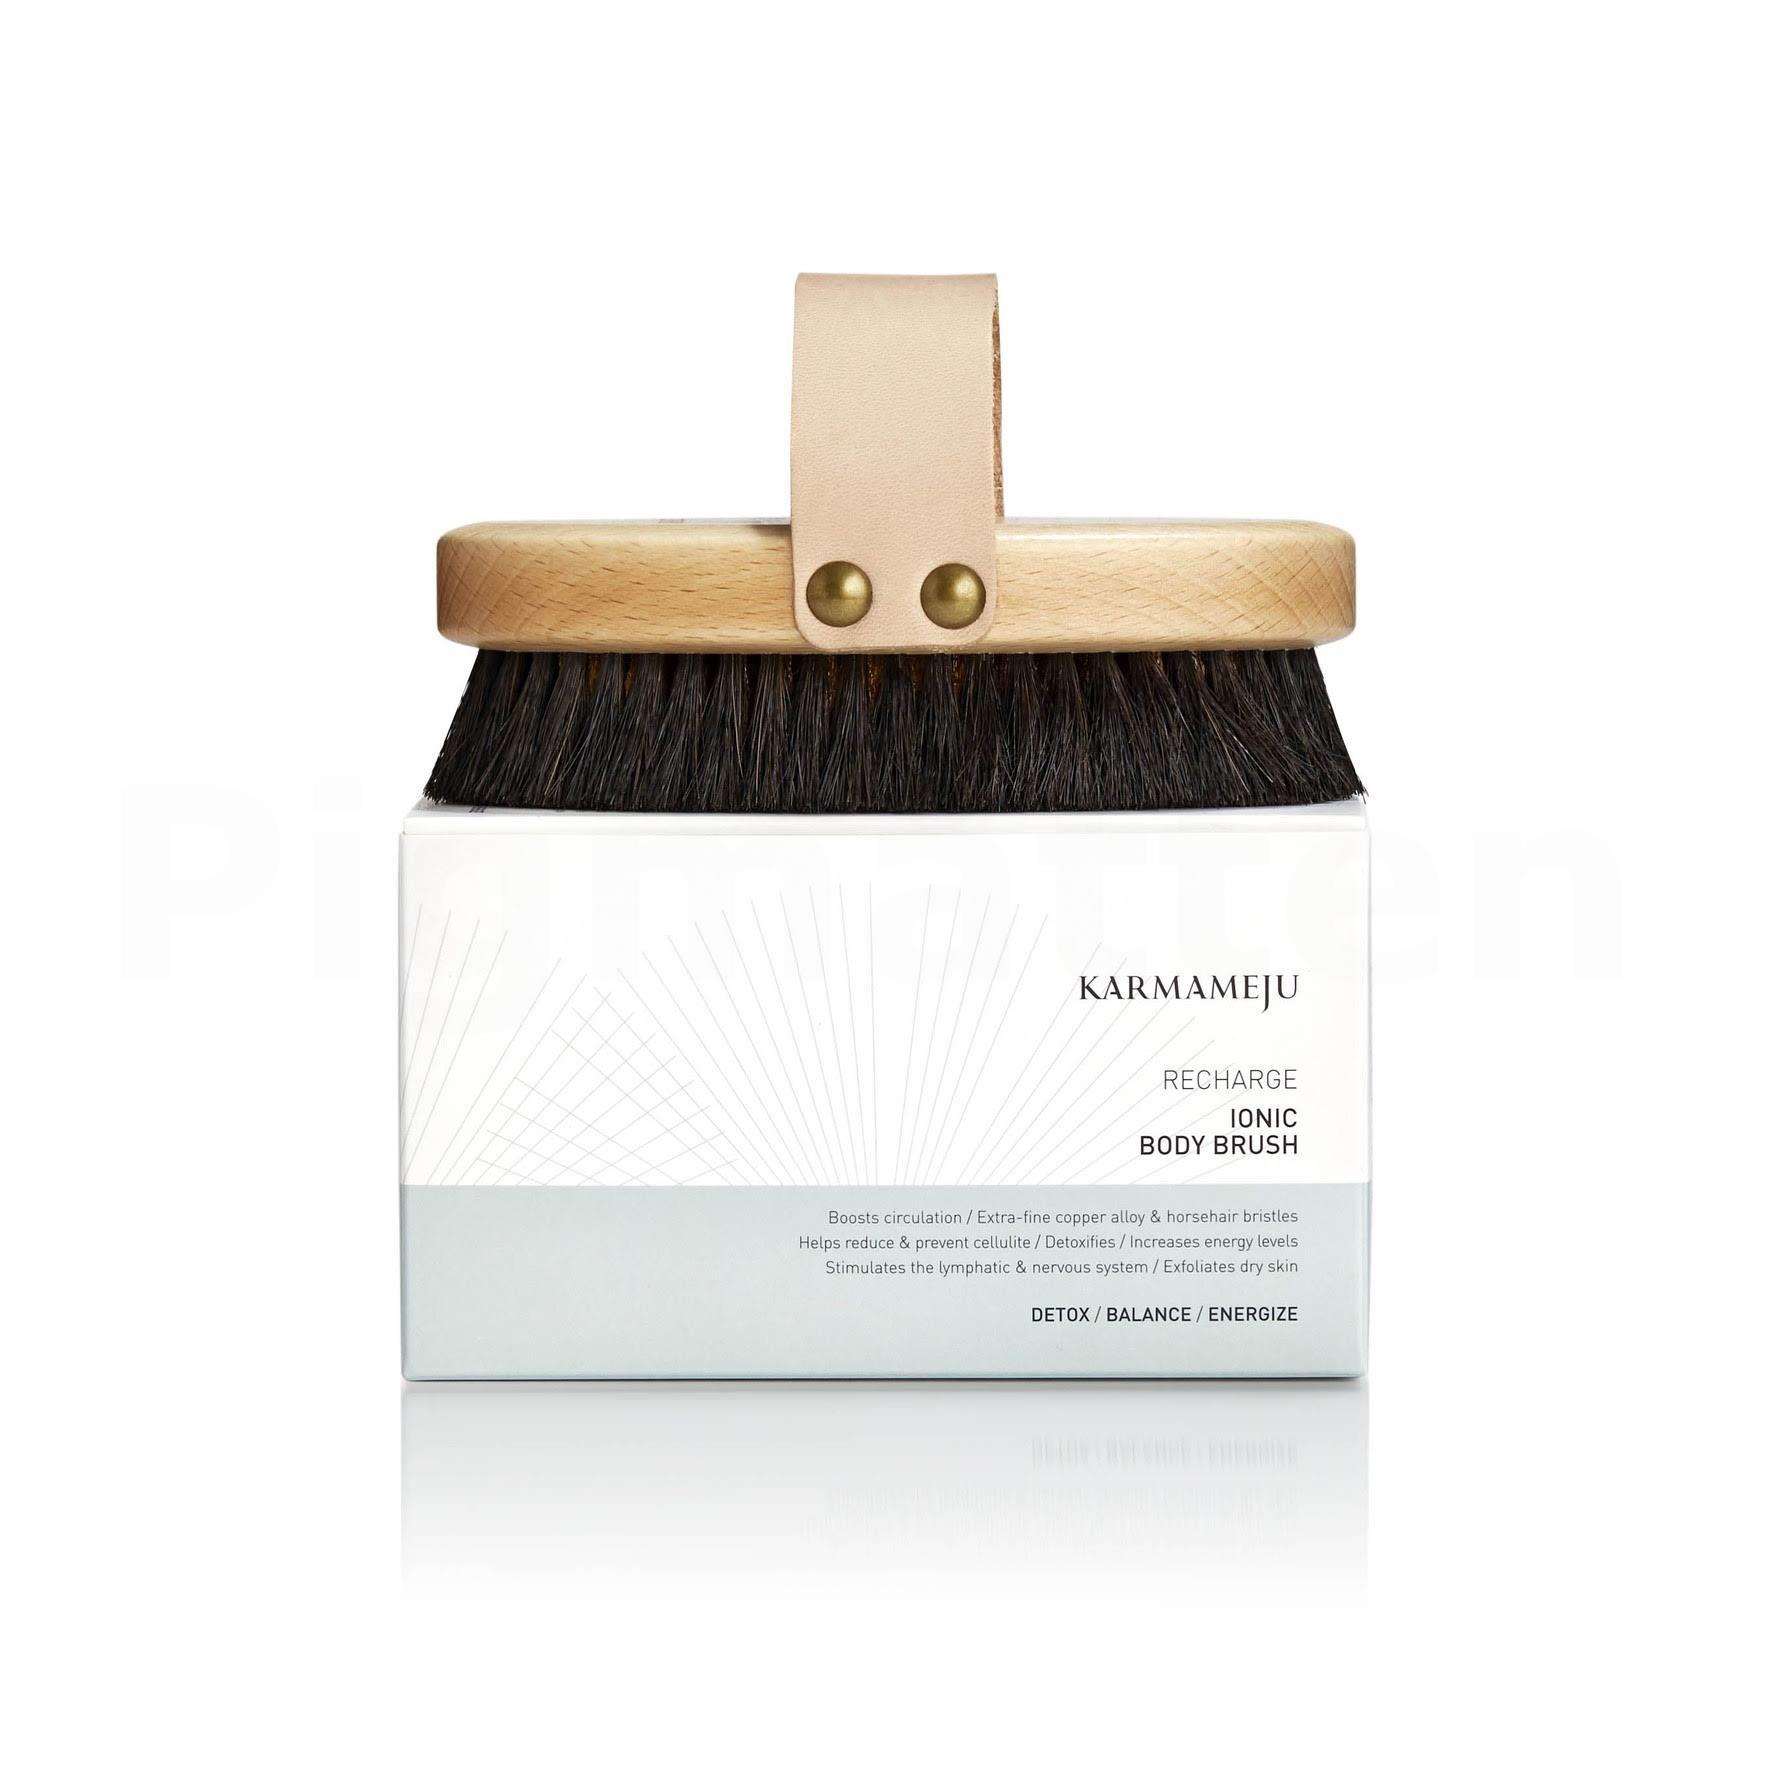 Sidste nye Karmameju tørbørste | Køb Karmameju tørbørste RECHARGE GQ-11